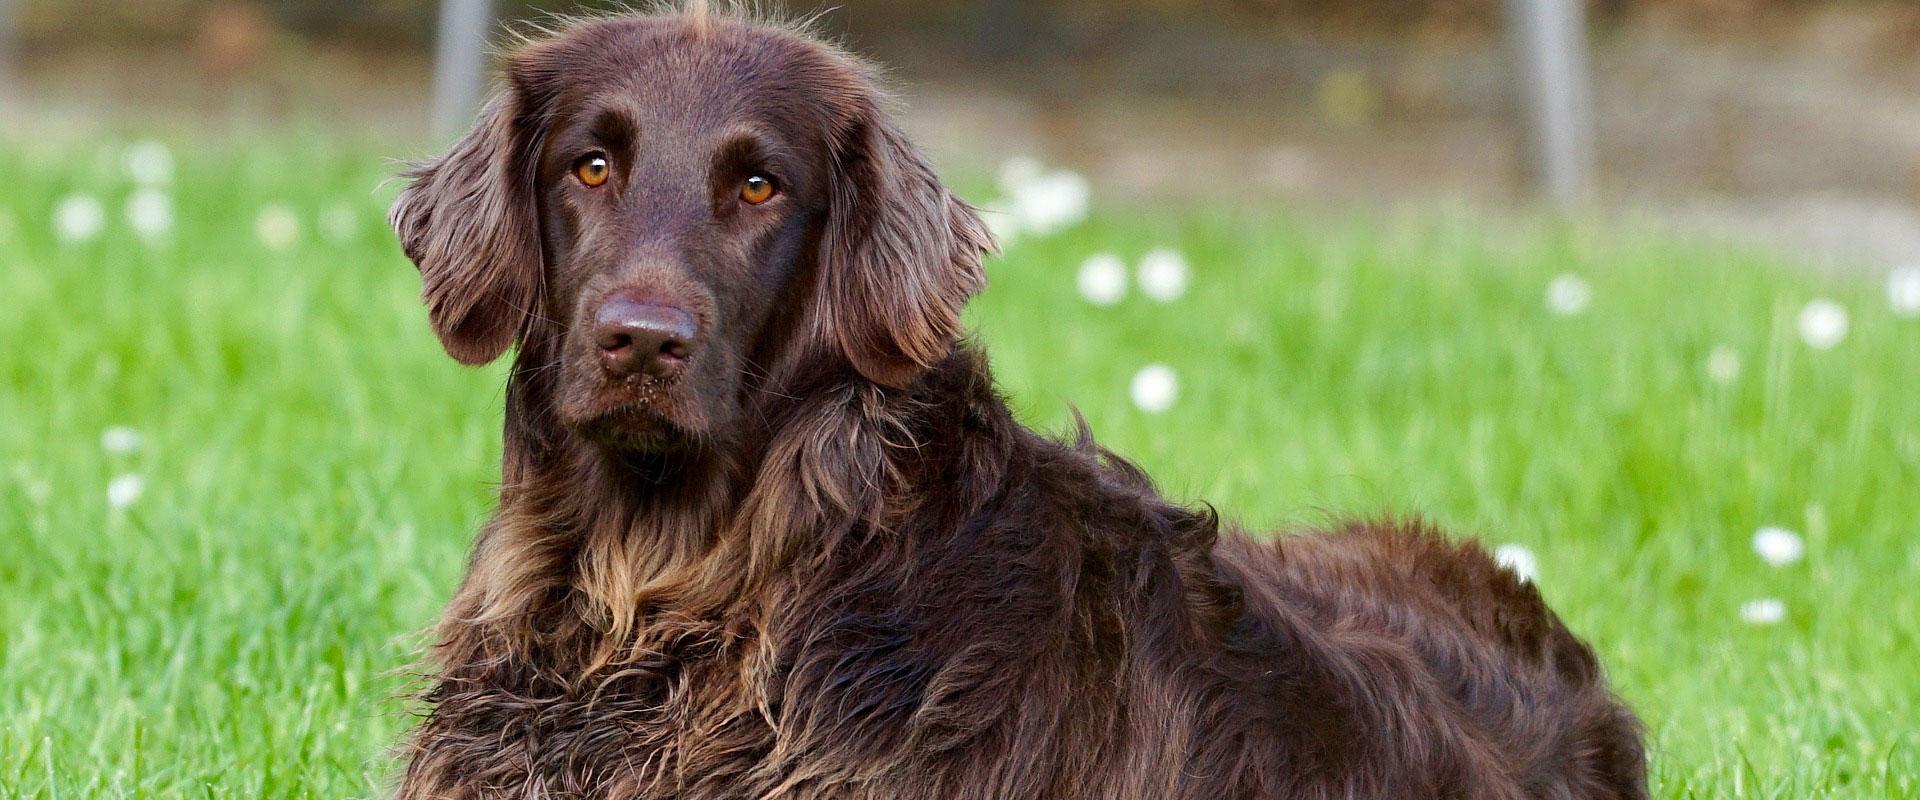 Brown dog lying in grass